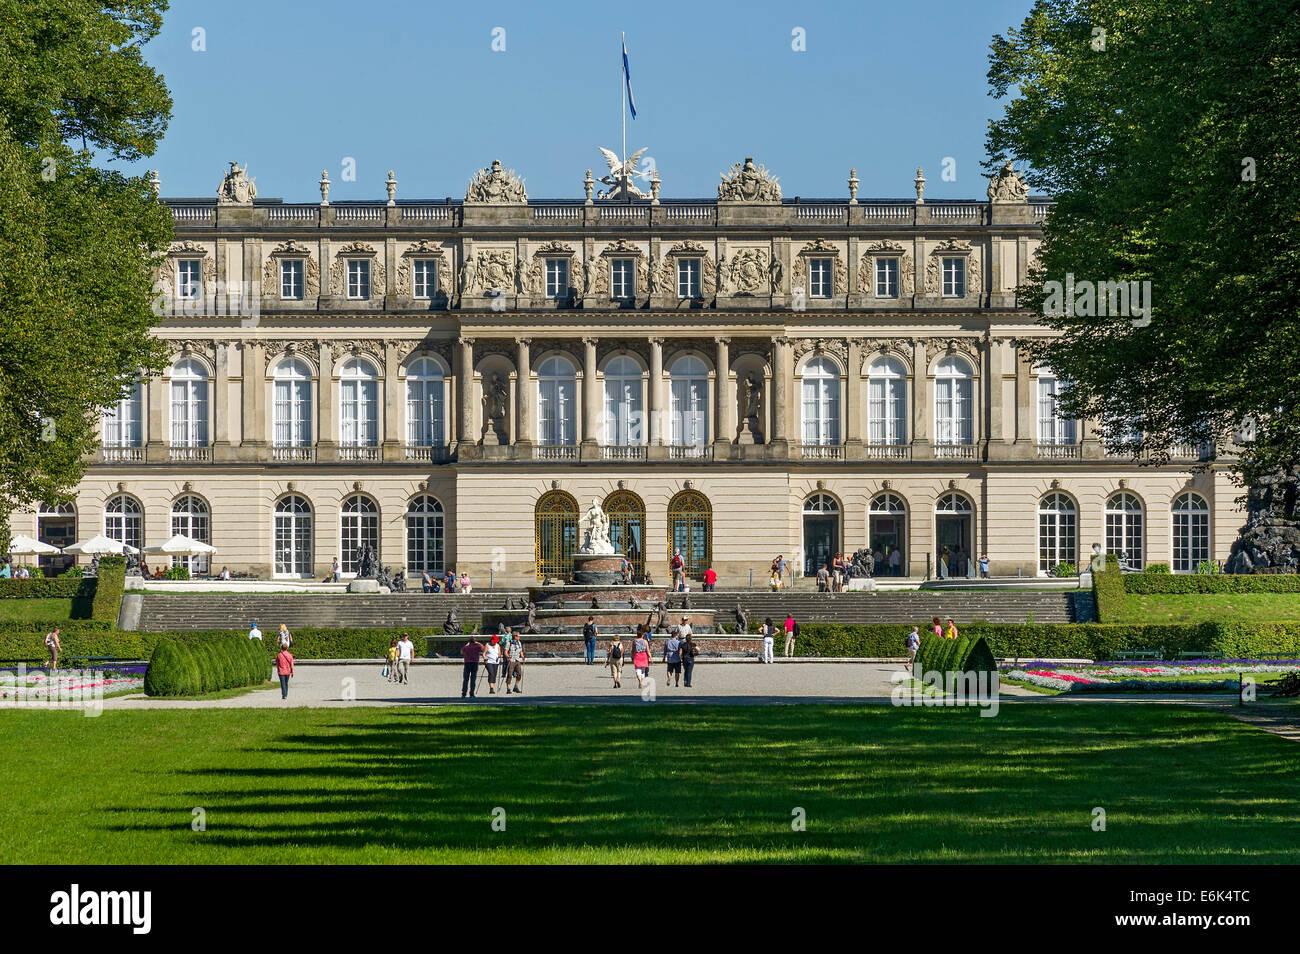 Herrenchiemsee New Palace, Schlosspark palace gardens, Herreninsel island, Chiemsee lake, Chiemgau, Upper Bavaria, Stock Photo